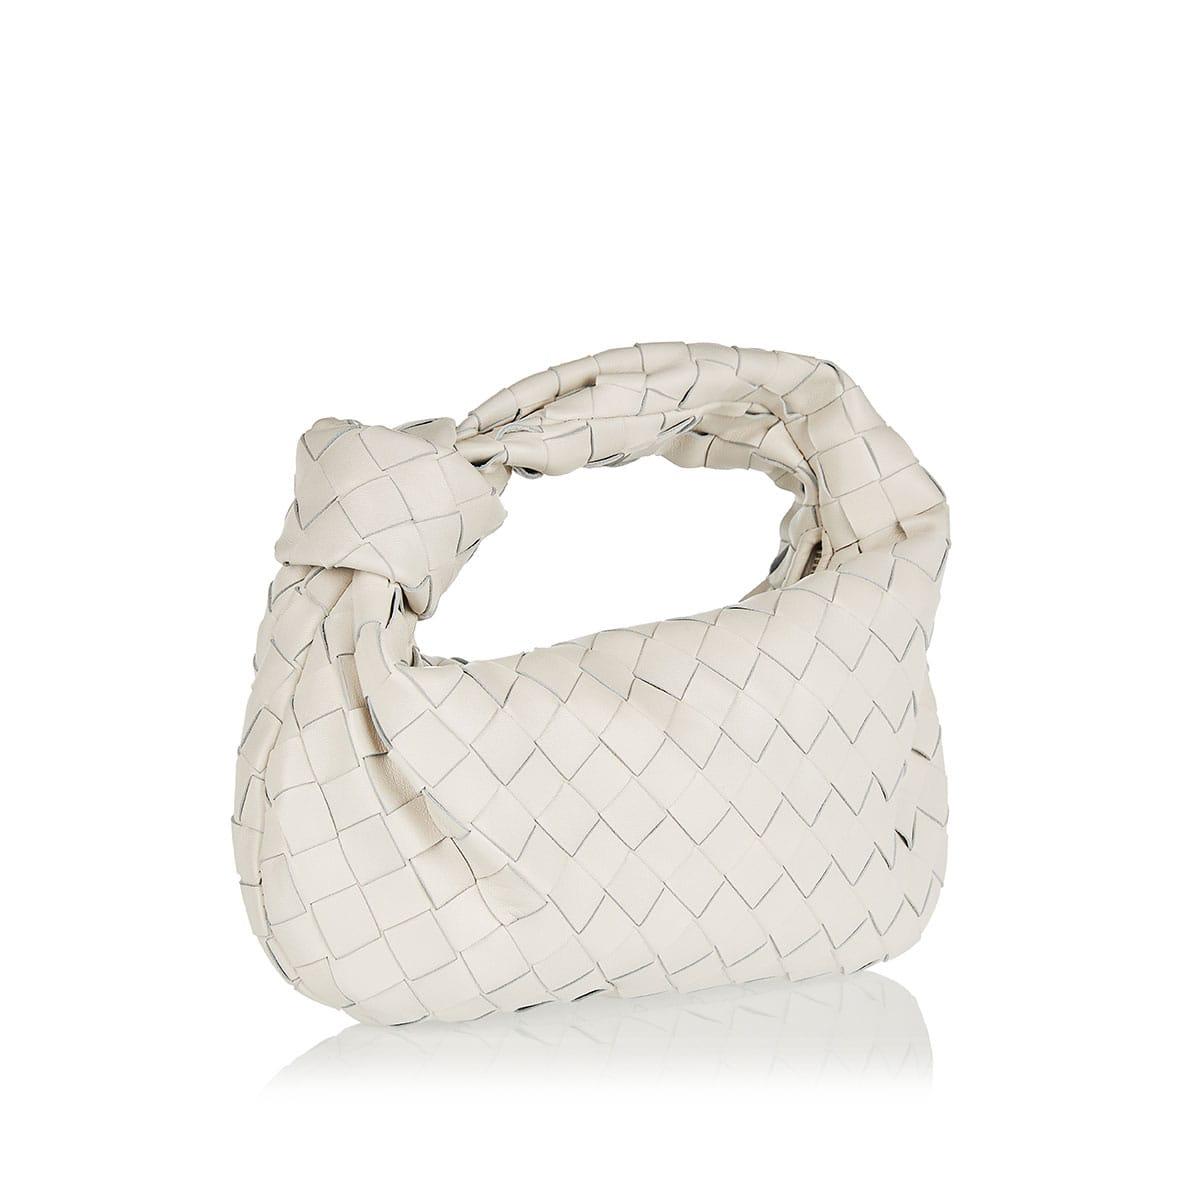 BV Jodie Intrecciato mini leather bag